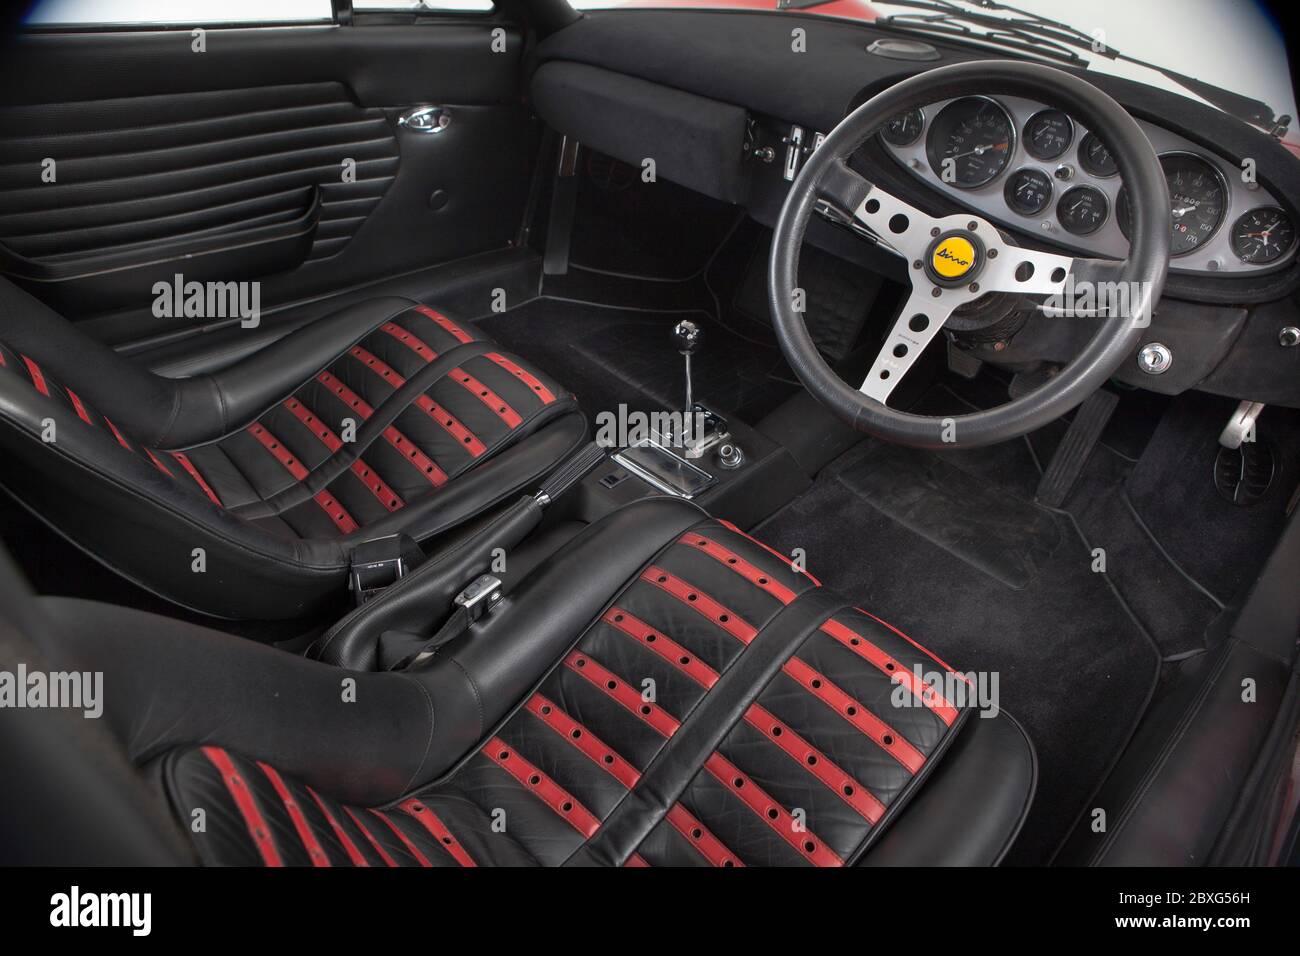 Ferrari Dino 246 Gts Interior Stock Photo Alamy